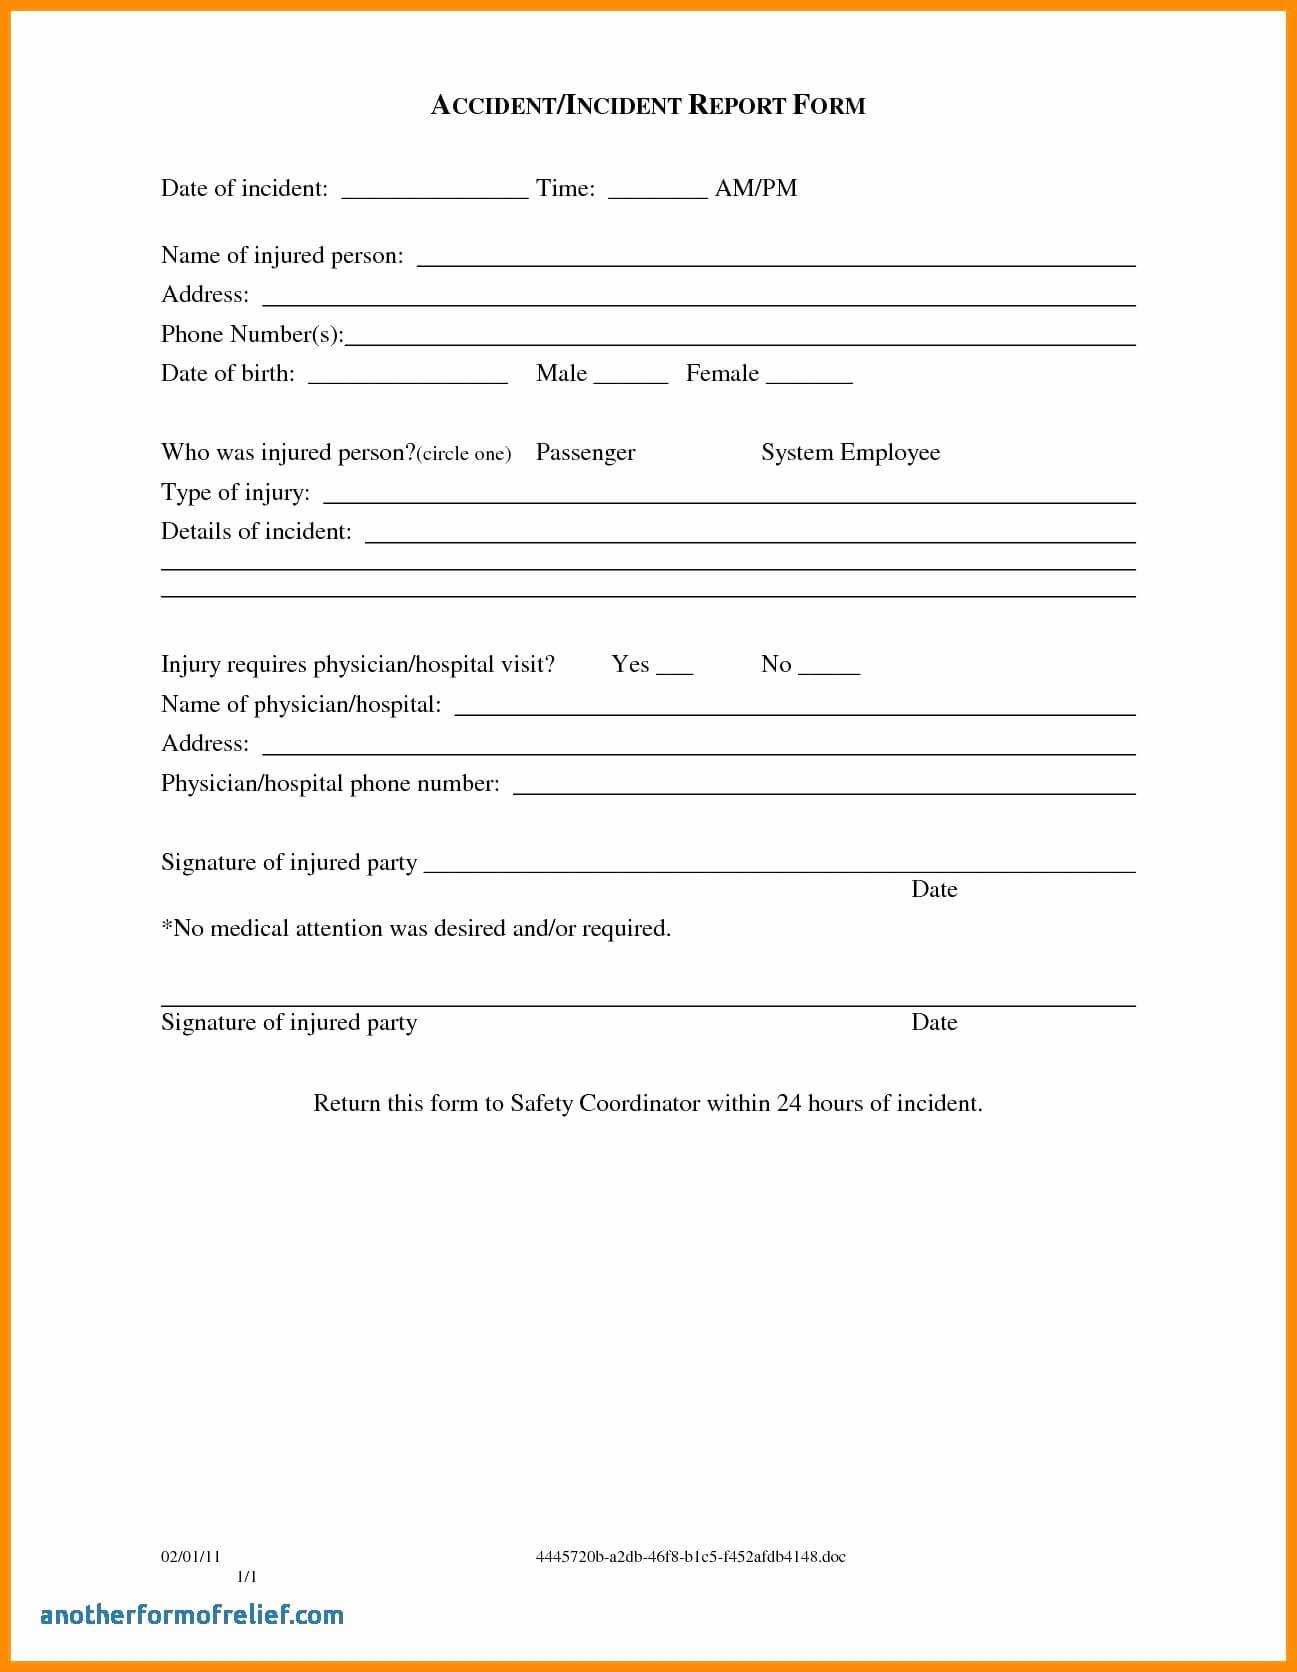 003 Template Ideas Incident Reportm Accidentms Hazard for Hazard Incident Report Form Template